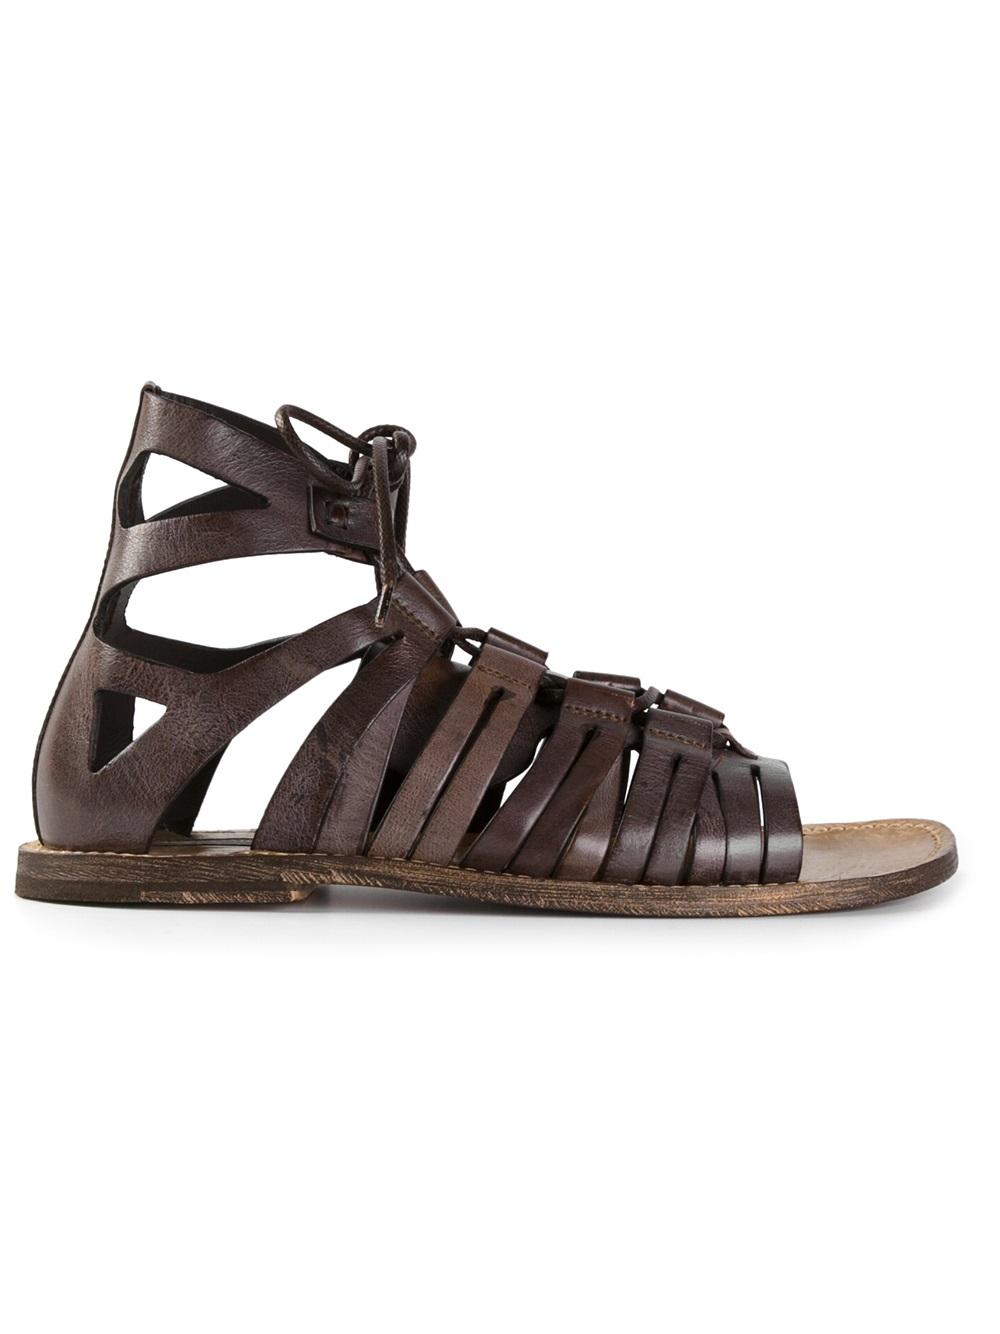 6cdefe248 Lyst - Dolce   Gabbana Gladiator Sandals in Brown for Men